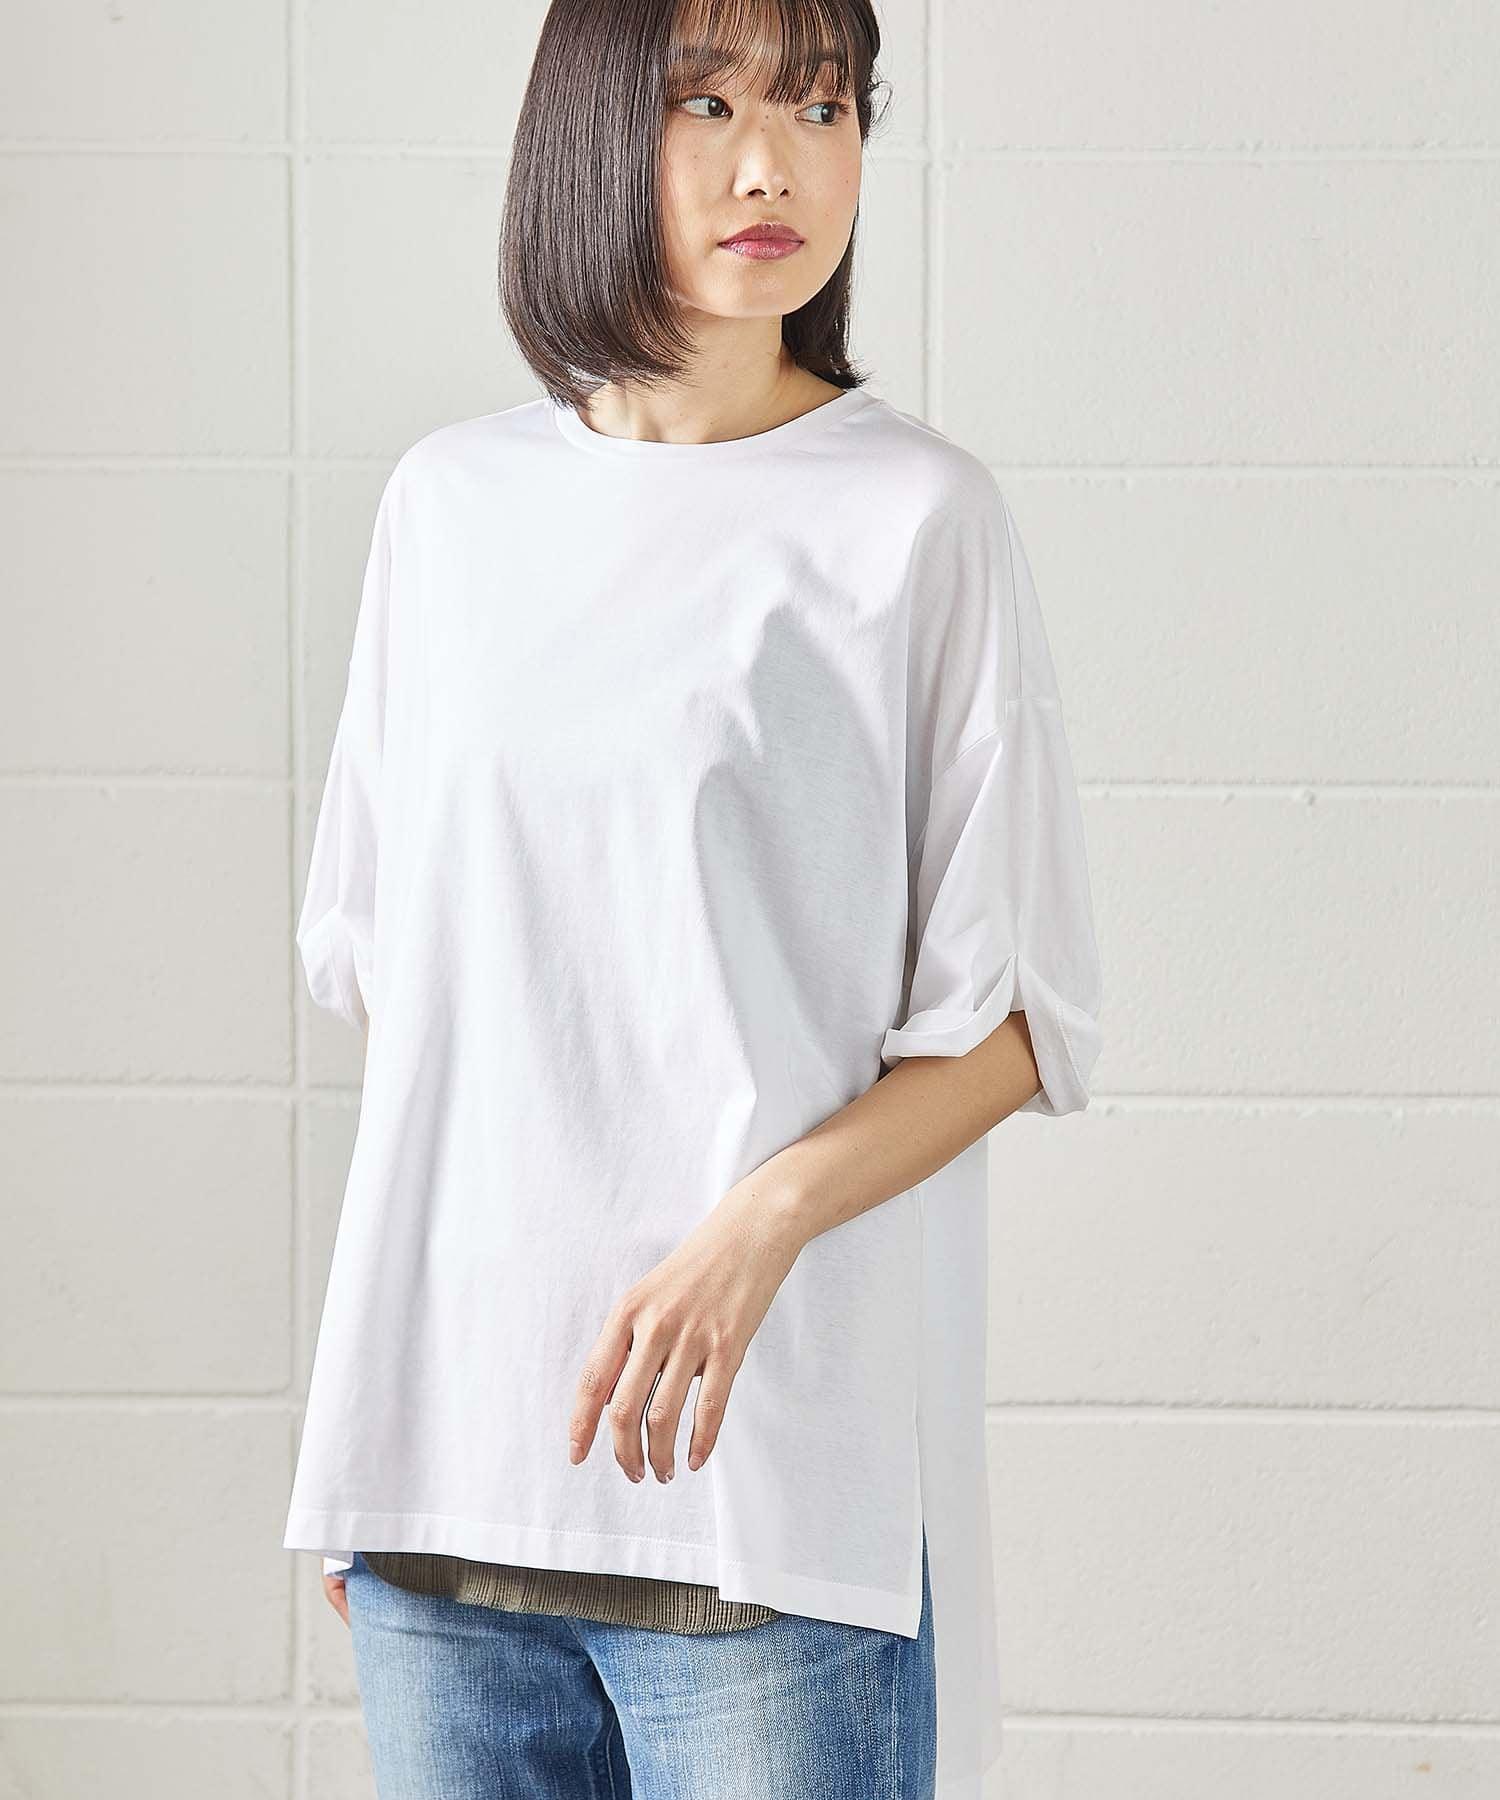 OUVRAGE CLASSE(ウヴラージュクラス) レディース 袖ロールアップTシャツ ホワイト